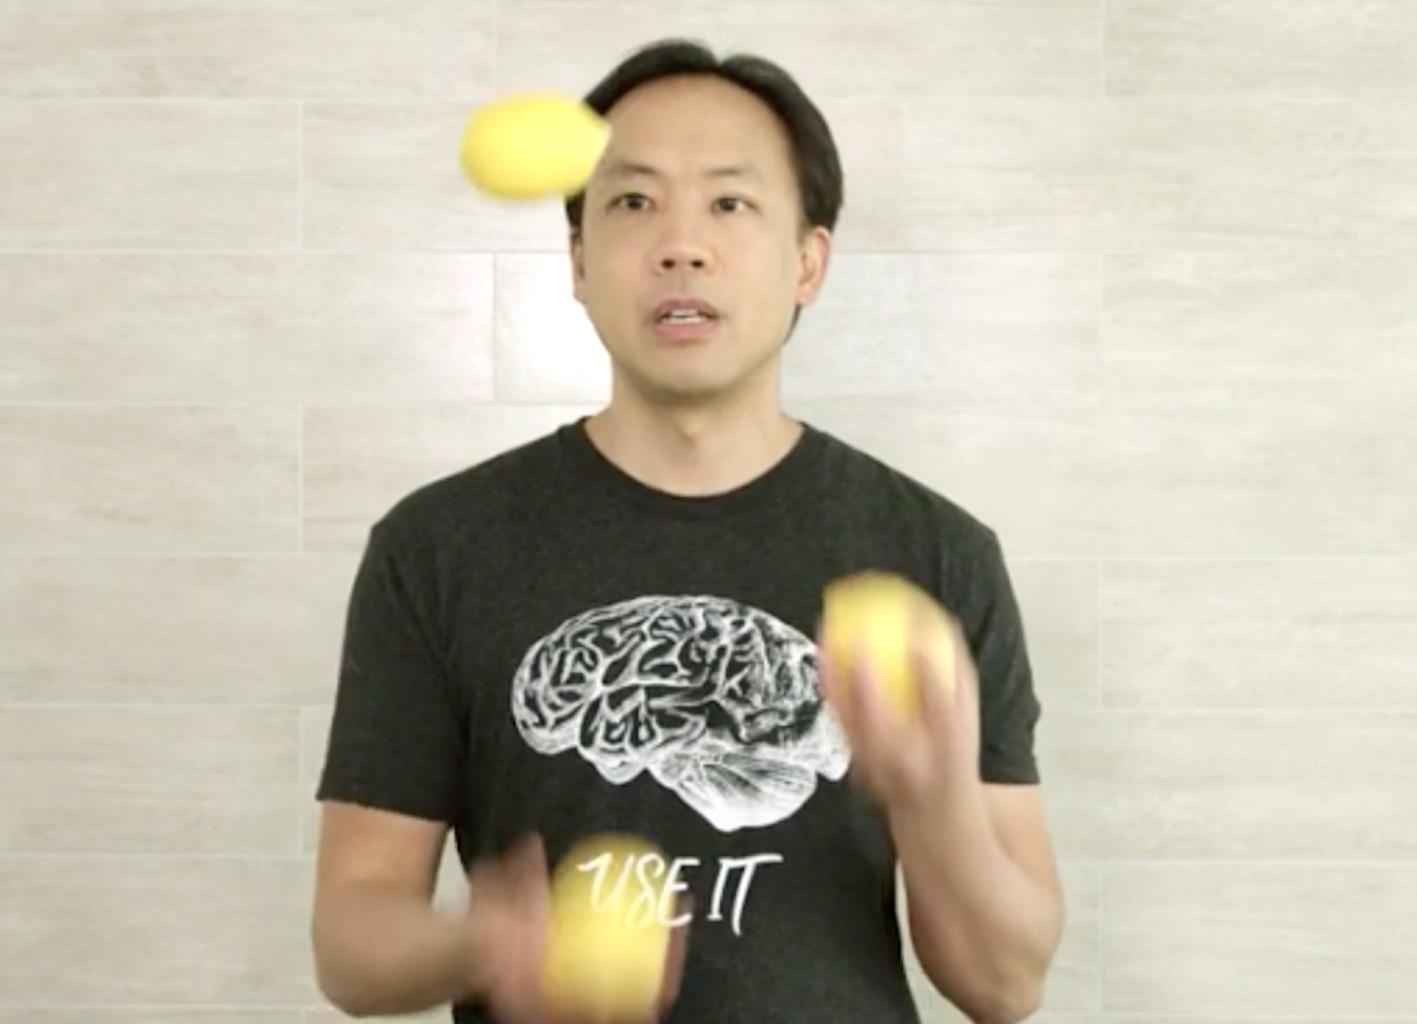 jim kwik juggling with lemons